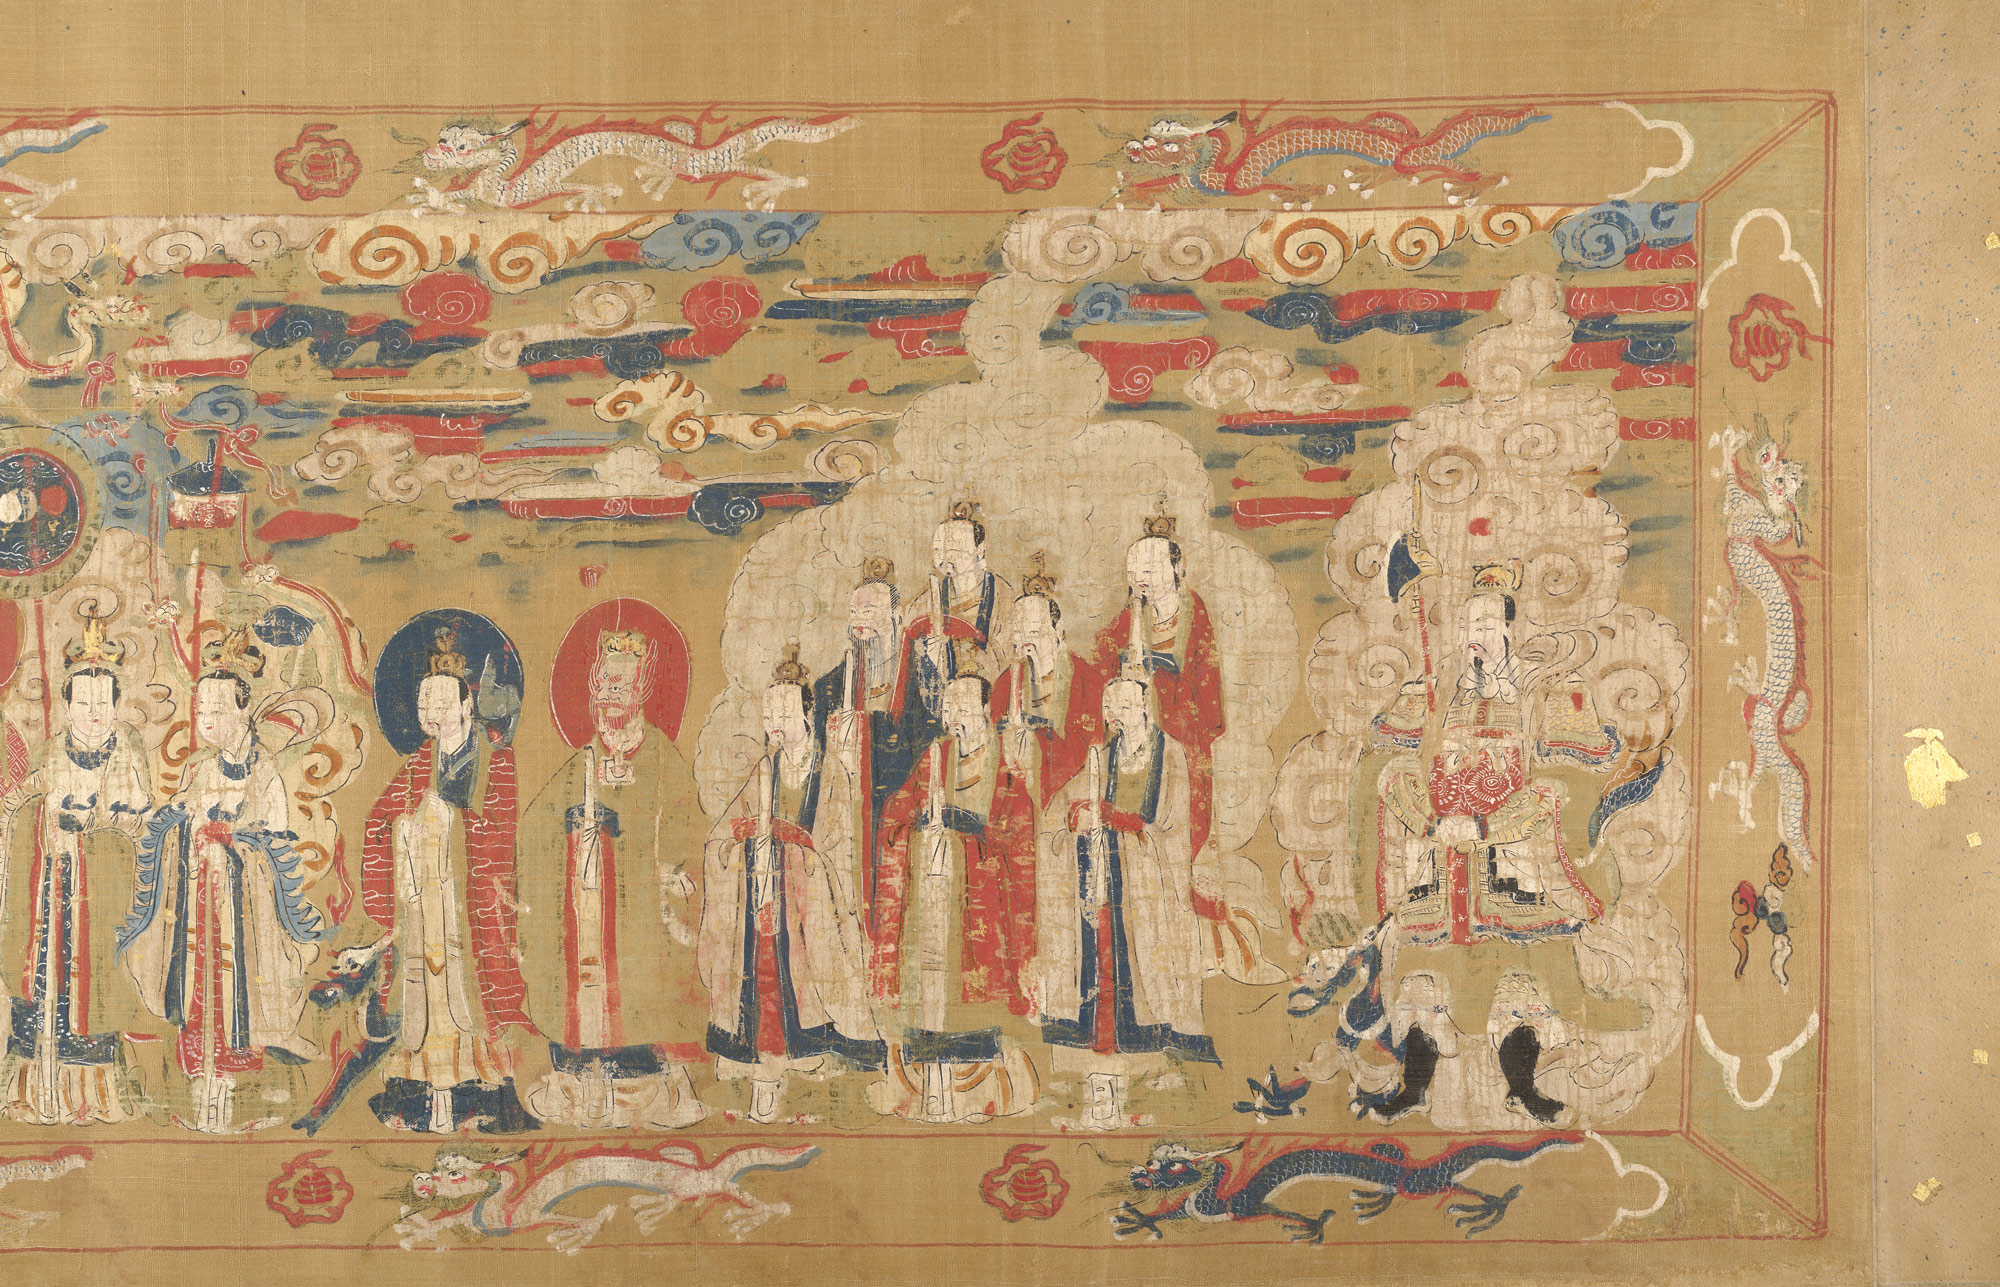 investiture of a daoist deity work of art heilbrunn timeline  investiture of a daoist deity